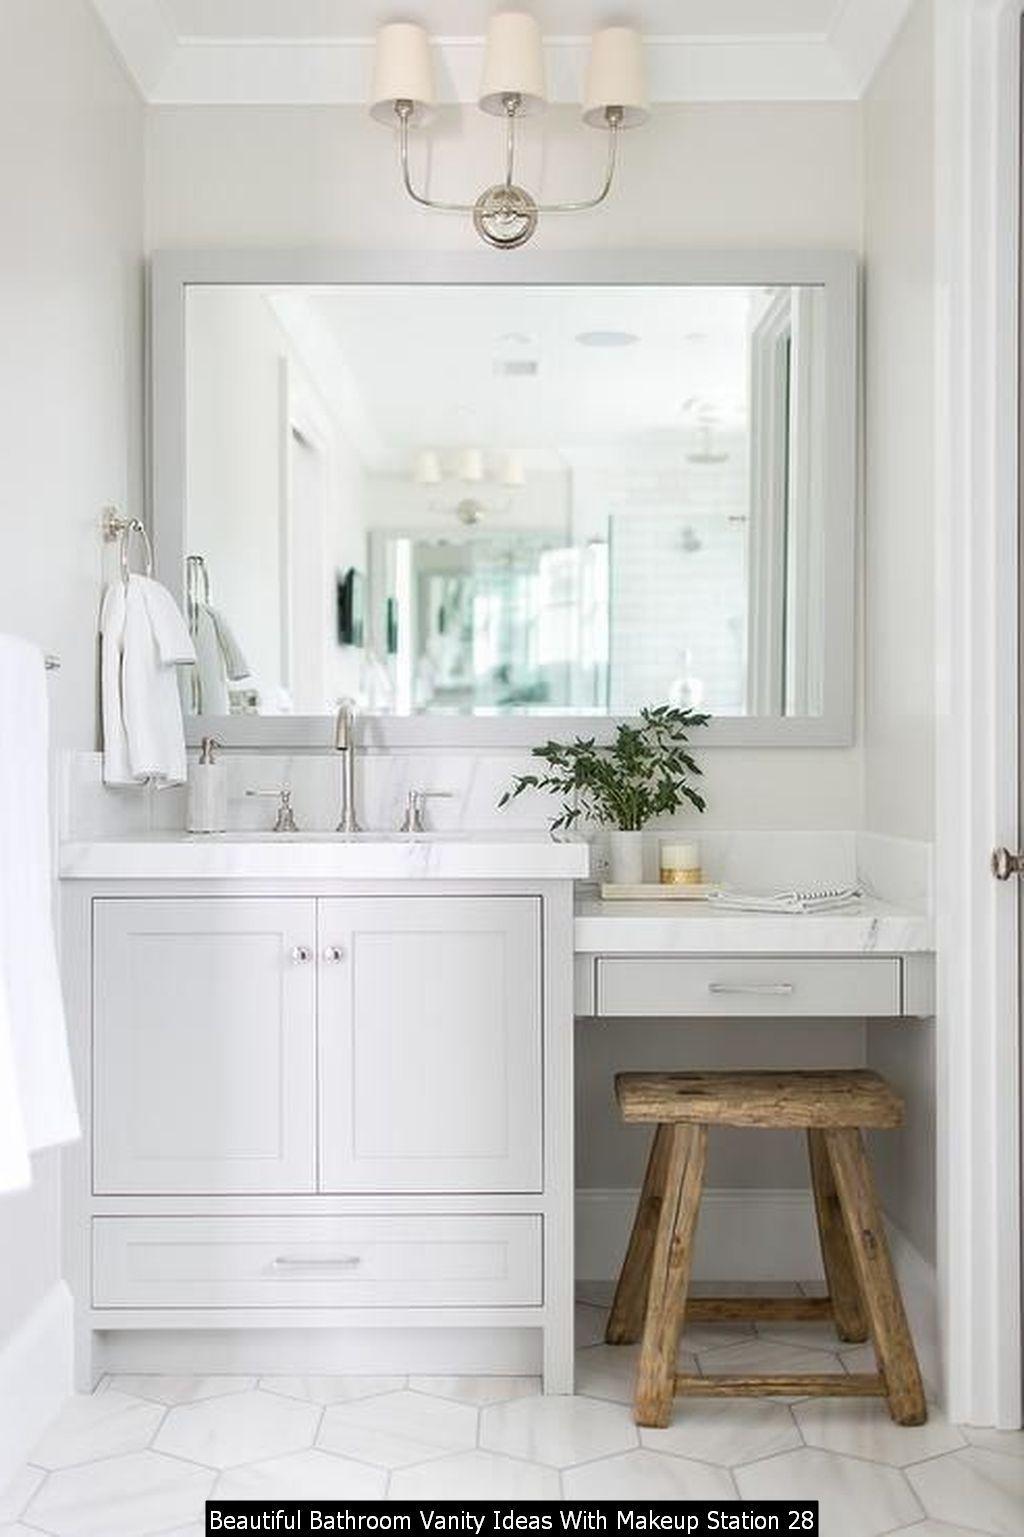 30 Beautiful Bathroom Vanity Ideas With Makeup Station White Bathroom Decor Gray Bathroom Decor Bathroom Design